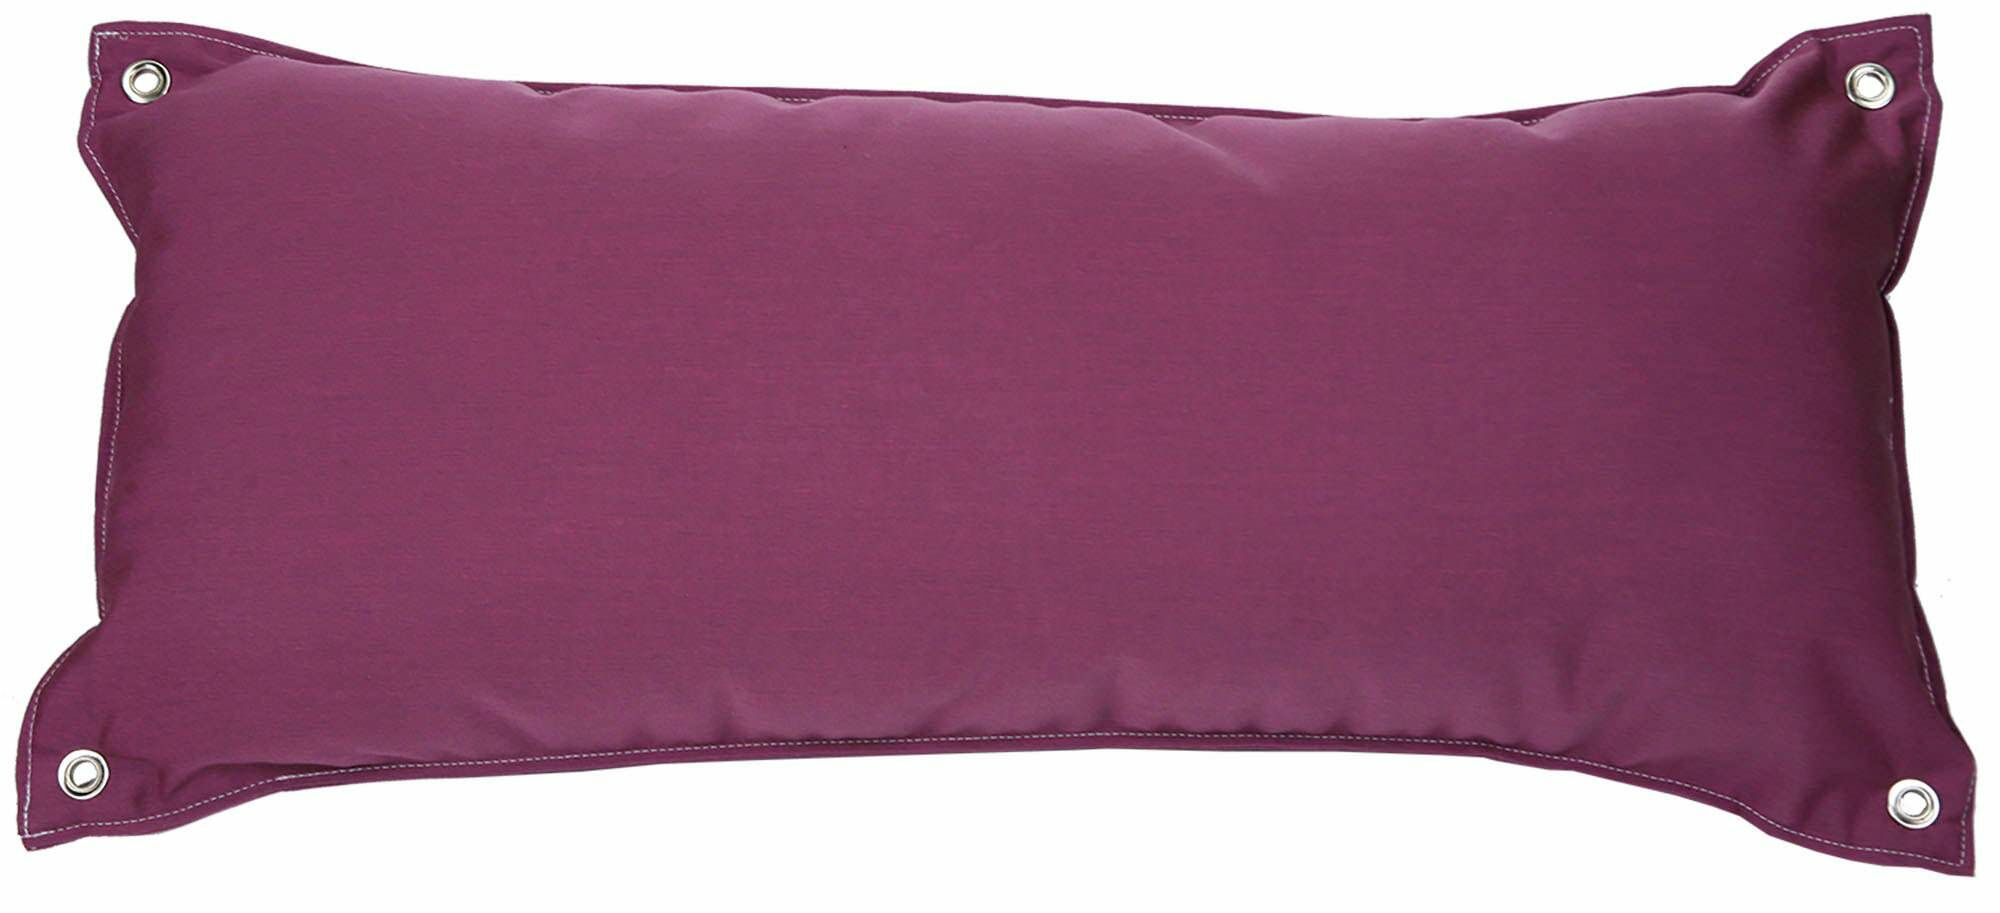 Edney Traditional Hammock Pillow Color: Canvas Iris